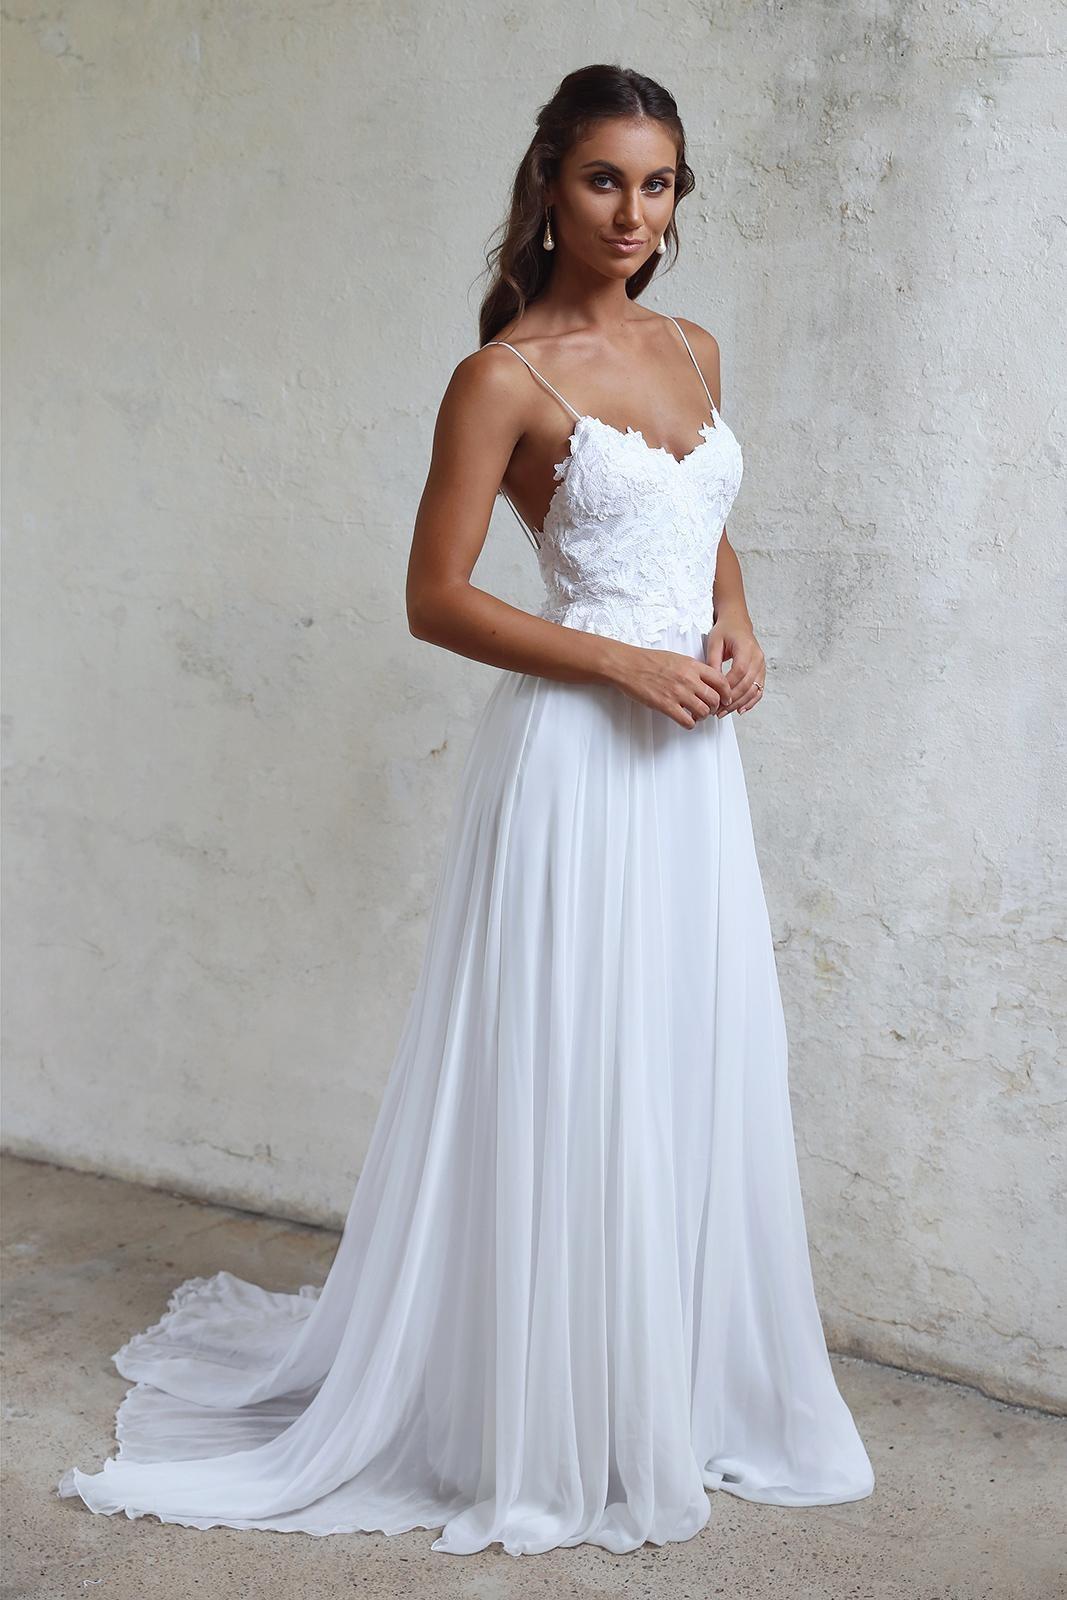 Simple Spaghetti Strap Wedding Dress 20 Best Ideas Simple A Line Spaghetti Straps Open Back Summer Wedding Dress